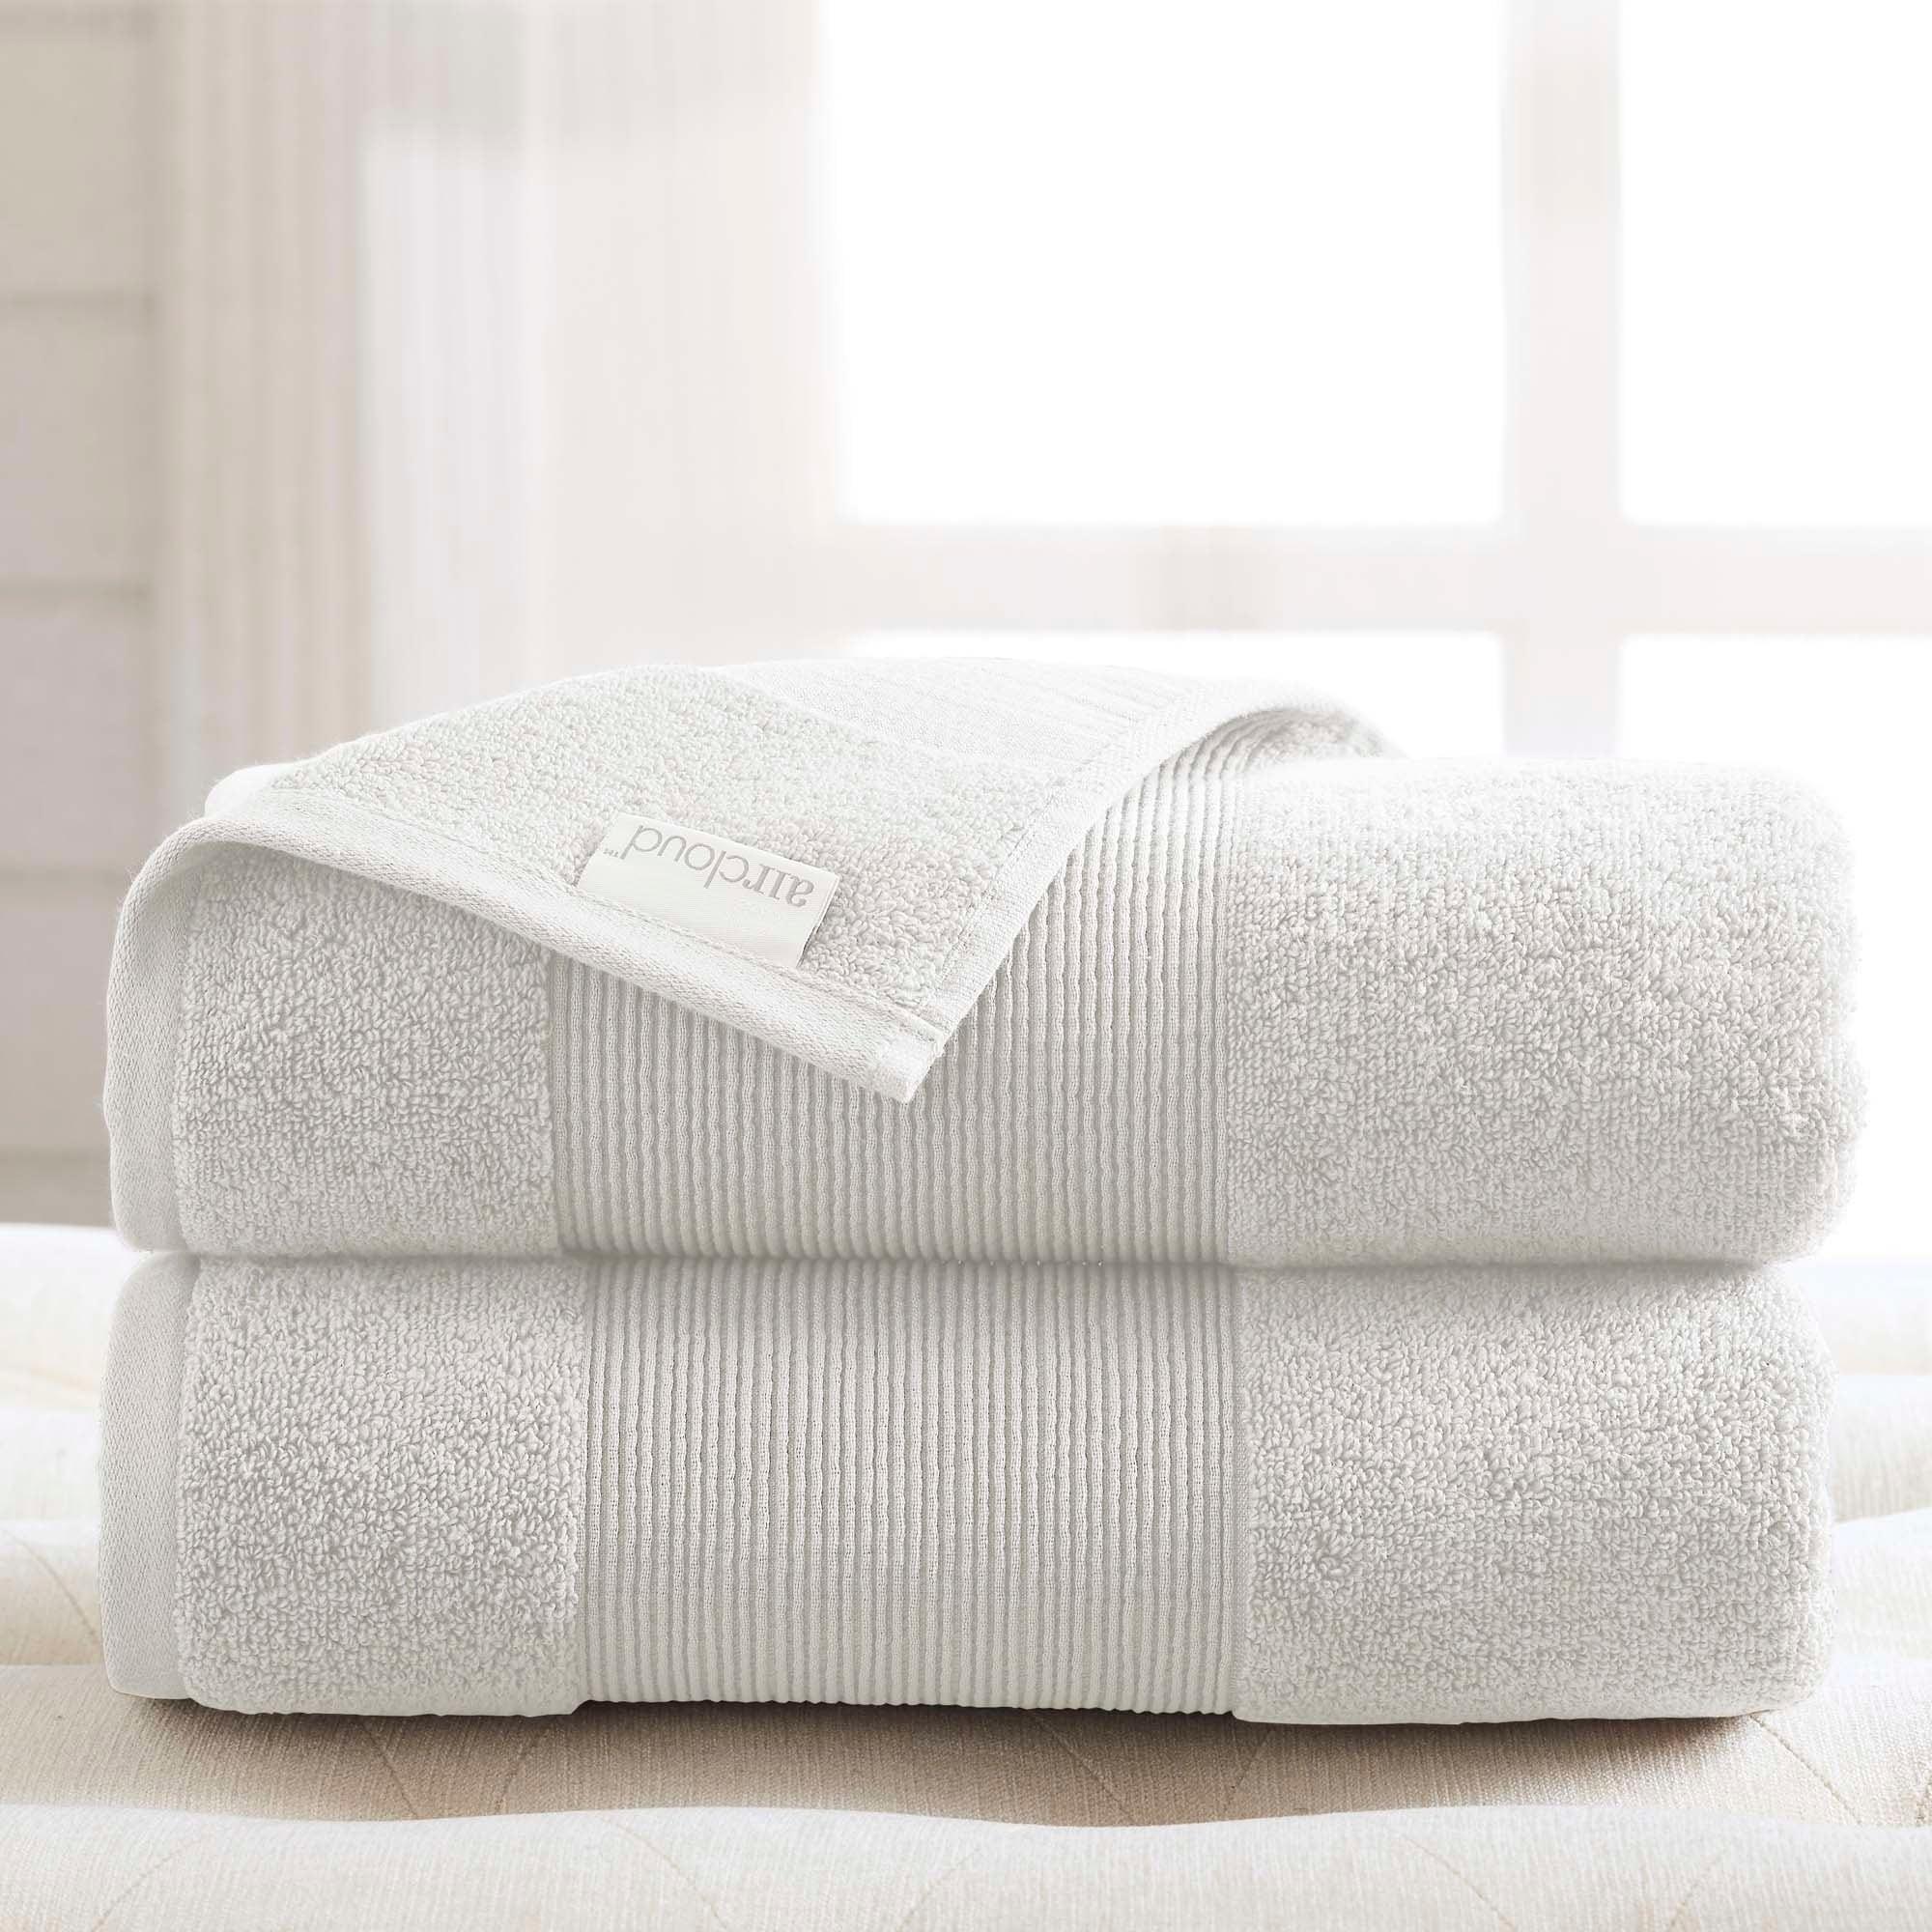 Home Furniture Diy Towels Pack 4 Bath Towel Bath Sheets And Jumbo Bath Sheets Luxury Egyptian Cotton Bortexgroup Com